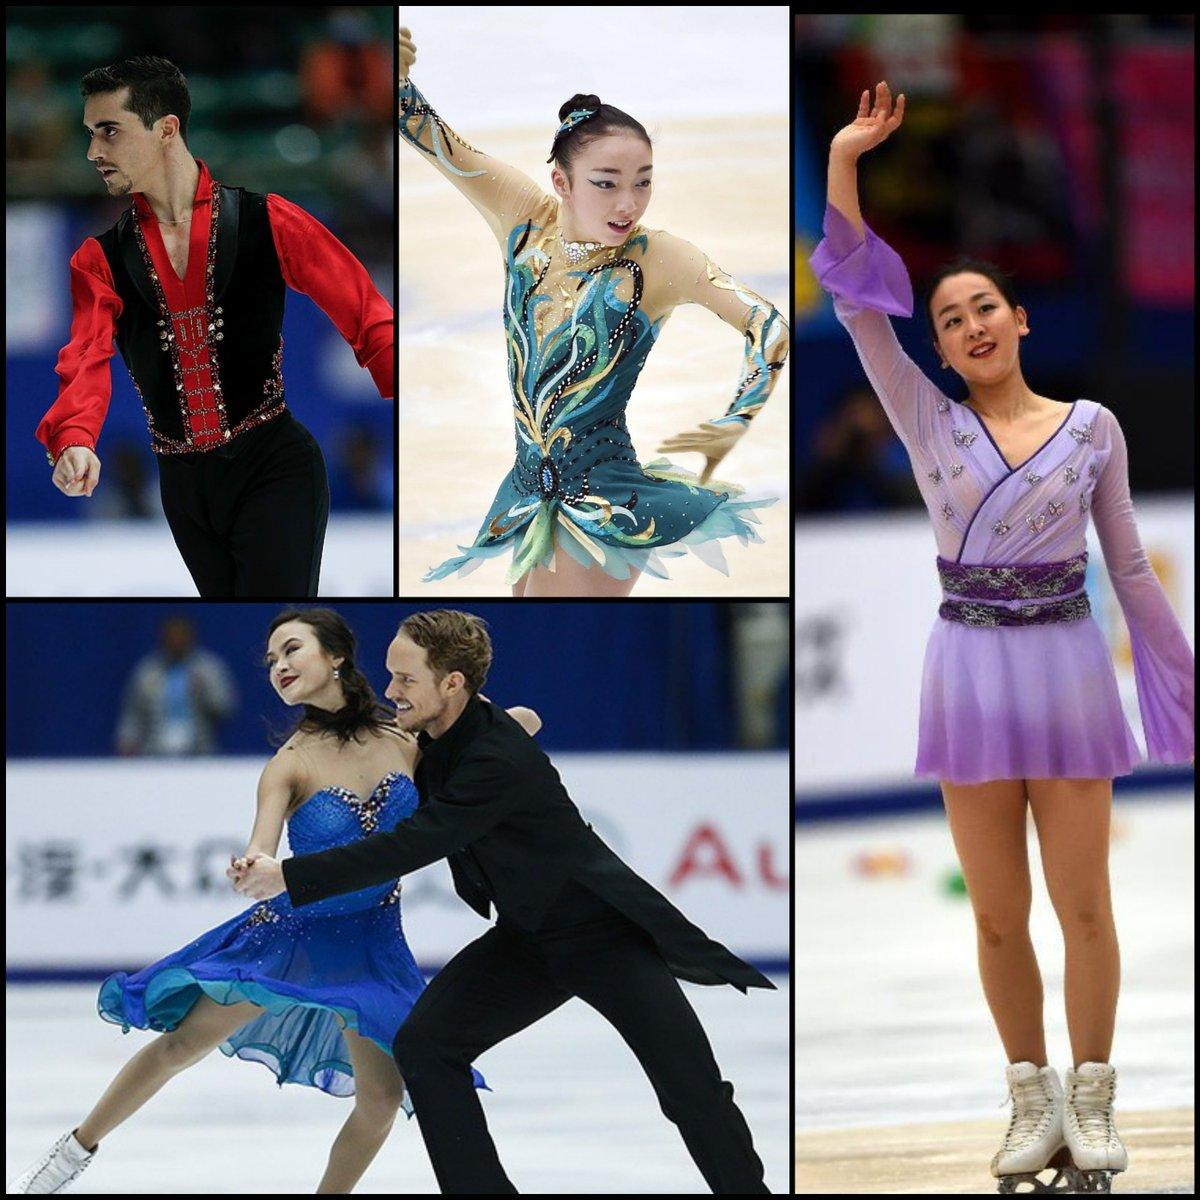 ICE STYLE: Figure Skating Costumes Recap of #CoC15 Ice Dance, Ladies, Men #CupofChina2015 https://t.co/Y9Ot33zKgG https://t.co/Fjb1j0uw5w